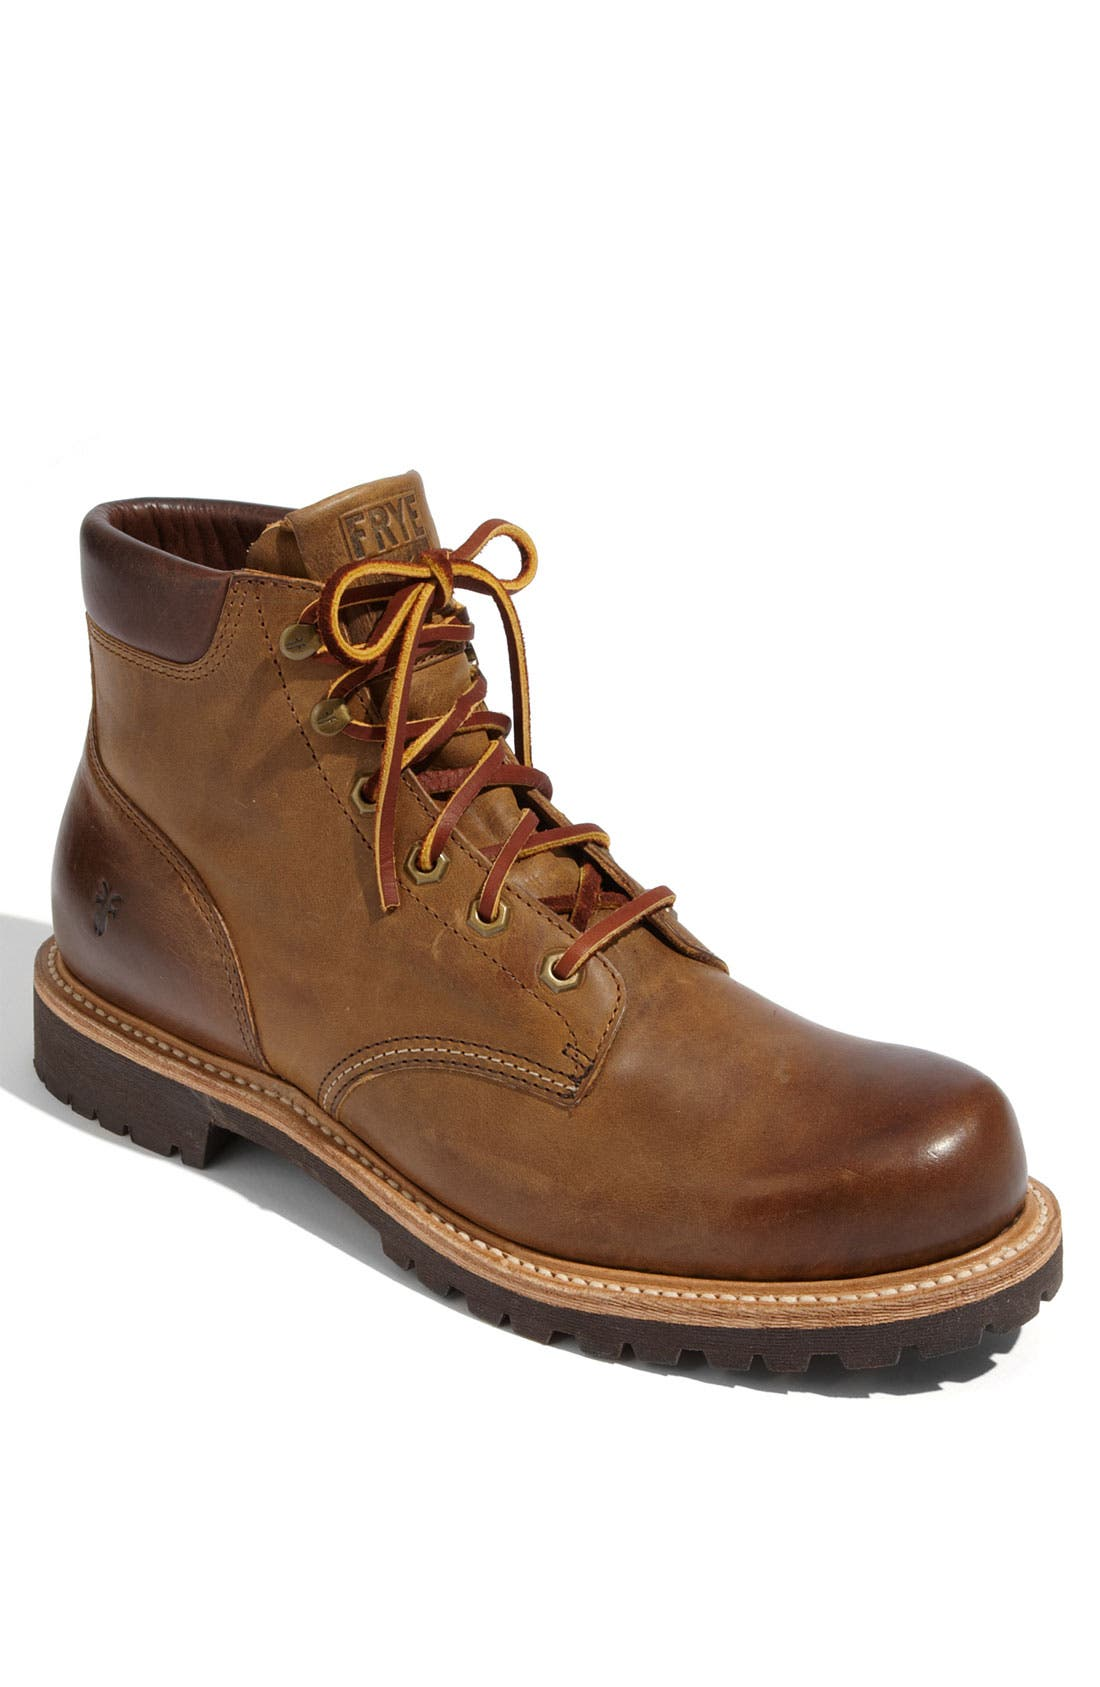 Main Image - Frye 'Dakota' Plain Toe Boot